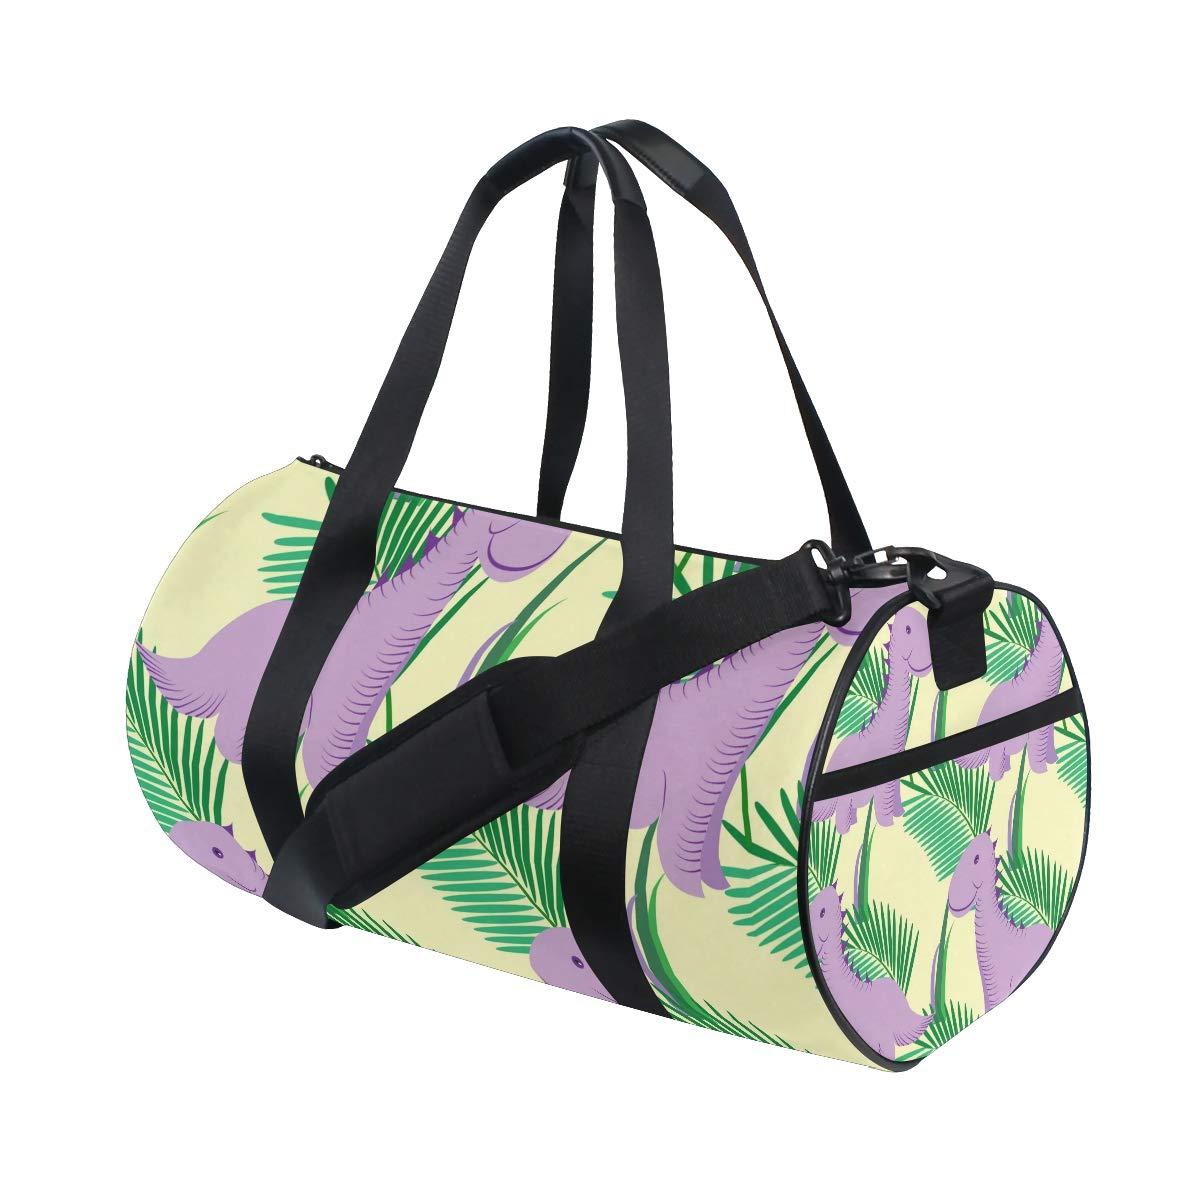 WIHVE Gym Duffel Bag Cute Purple Dinosaurs Tropical Leaves Sports Lightweight Canvas Travel Luggage Bag